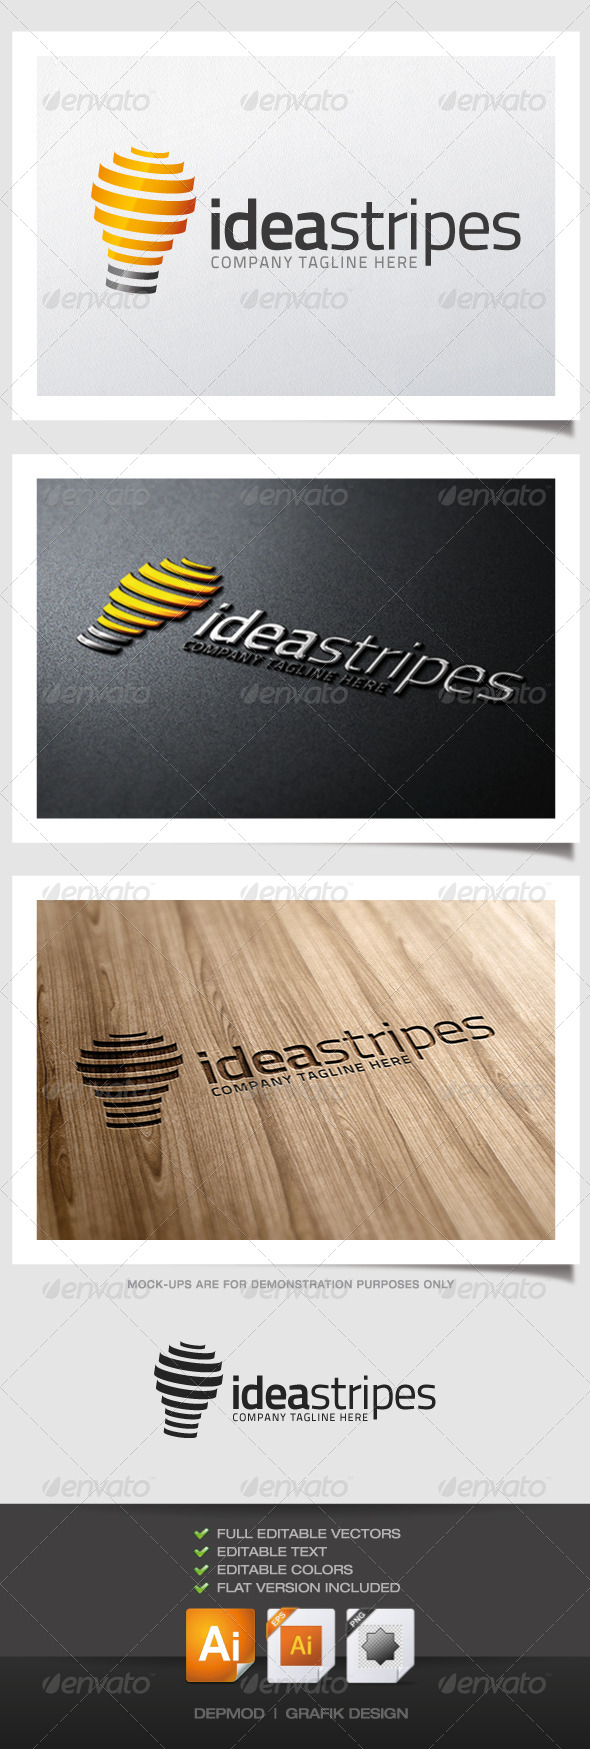 GraphicRiver Idea Stripes Logo 5140143